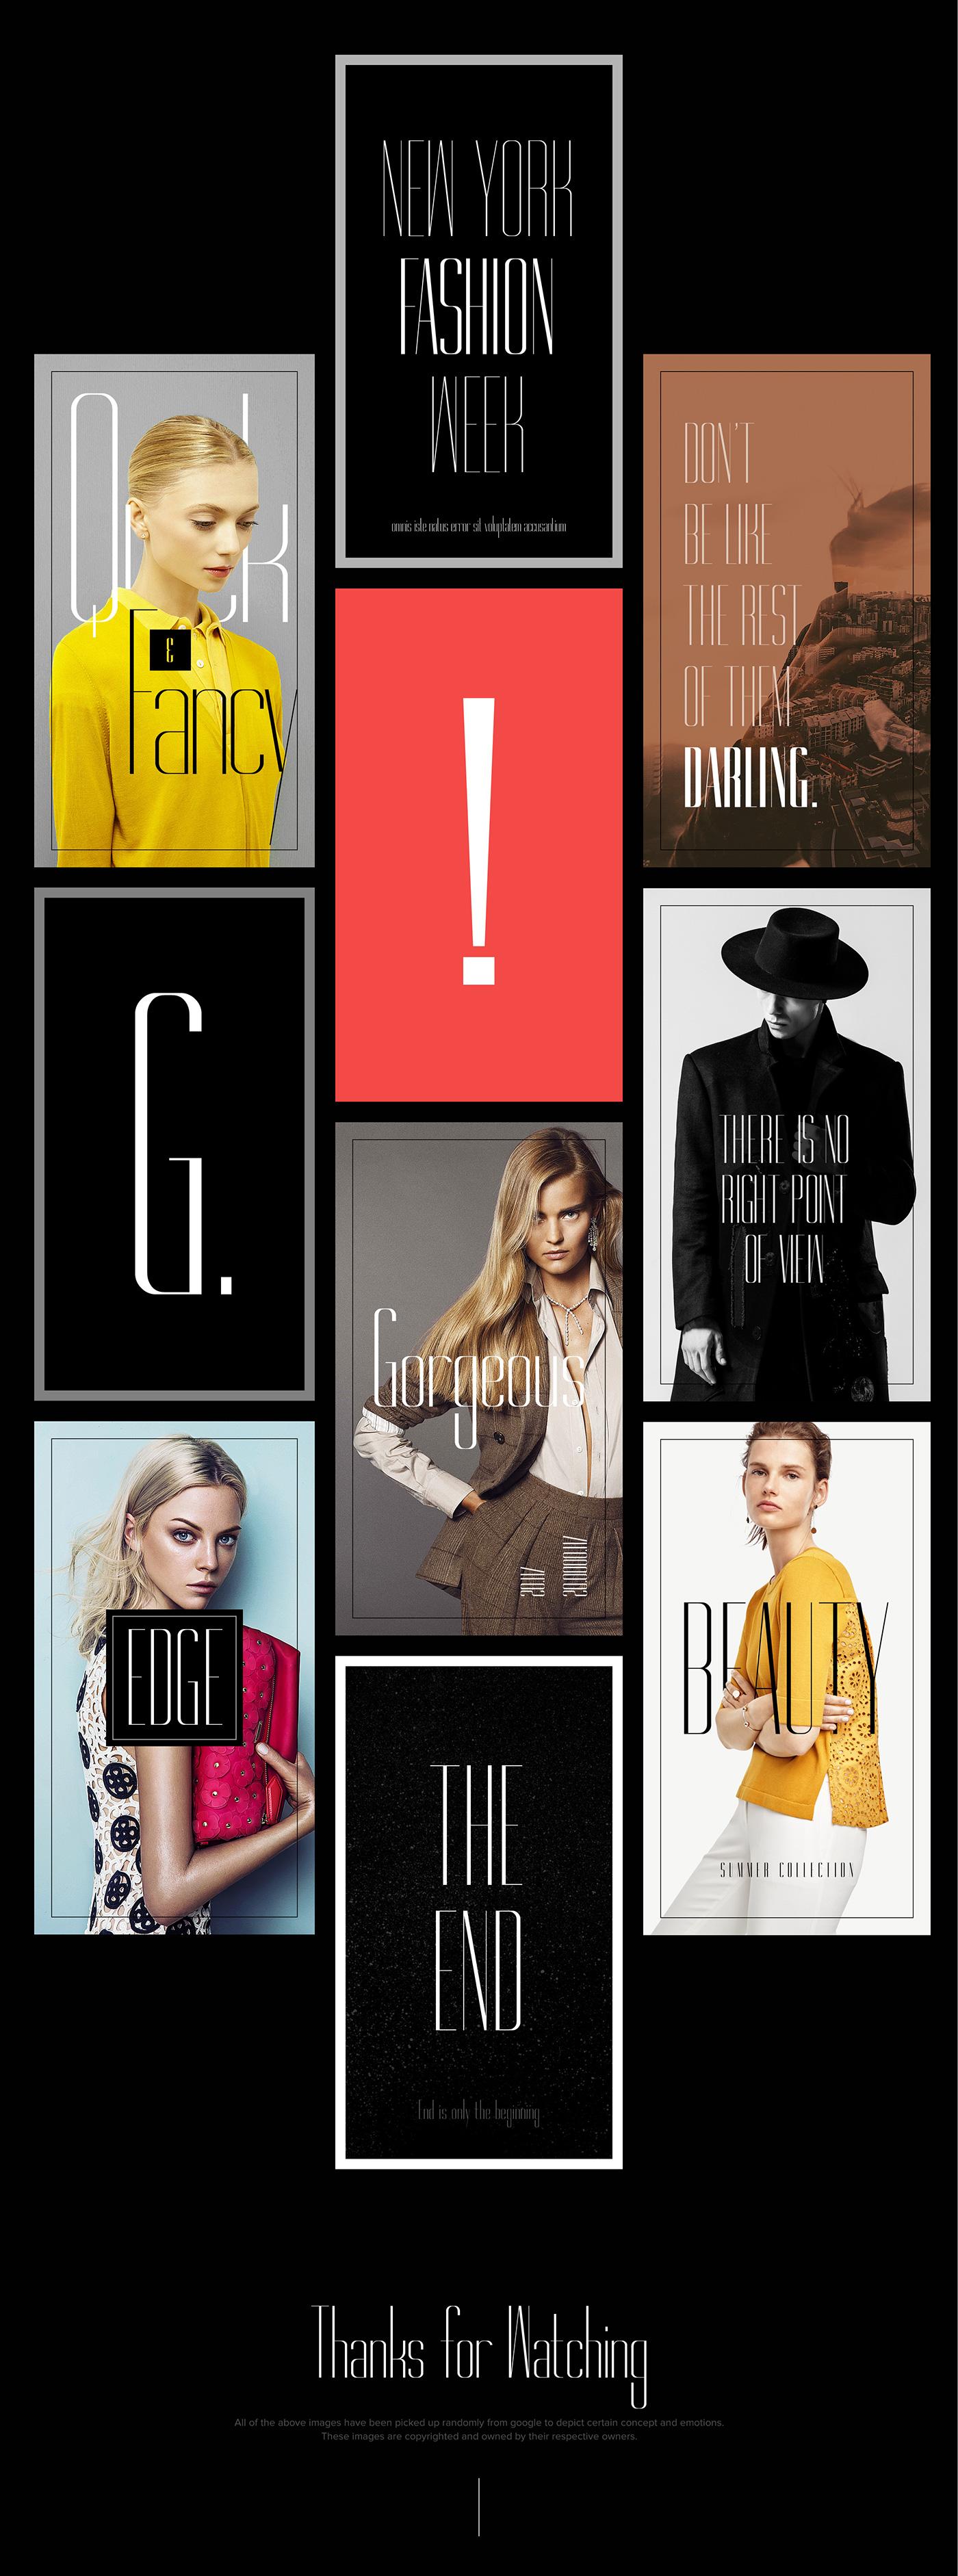 typography   Free font Typeface free typeface Fashion Typeface Condensed typeface typography design freebies typedesign magazine